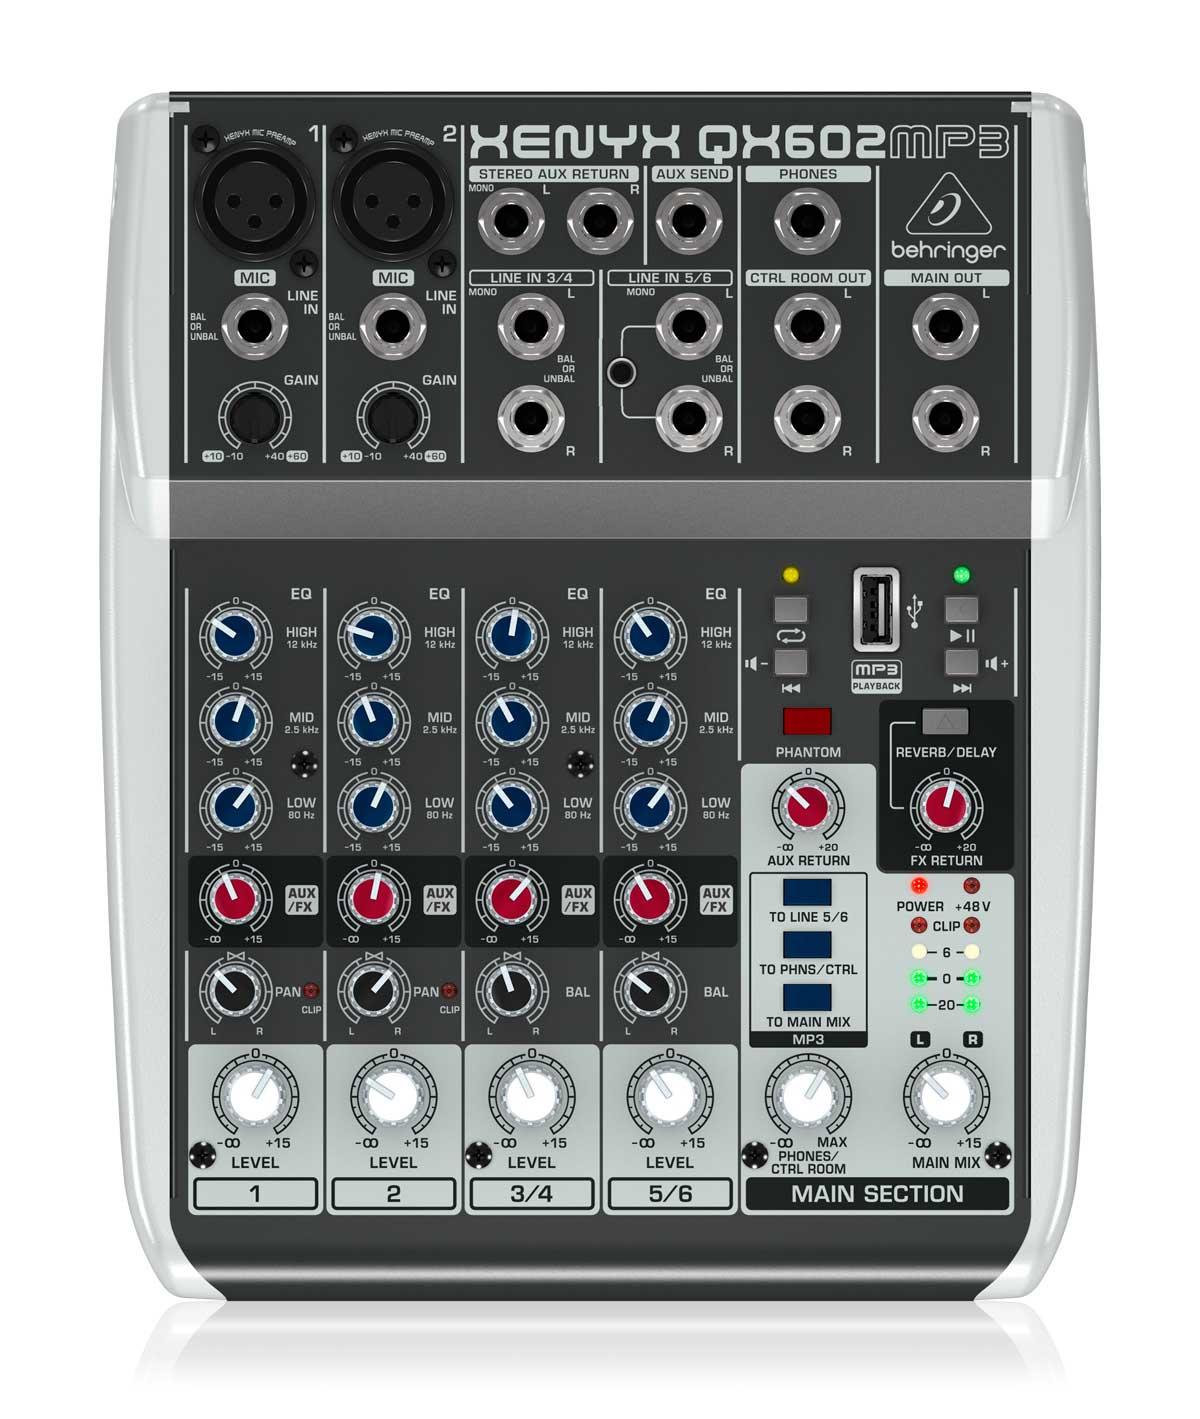 Mesa analógica 4 canais   2 canais XLR + 2 canais estéreo, EQ, MP3 Player e FX   Behringer QX602MP3